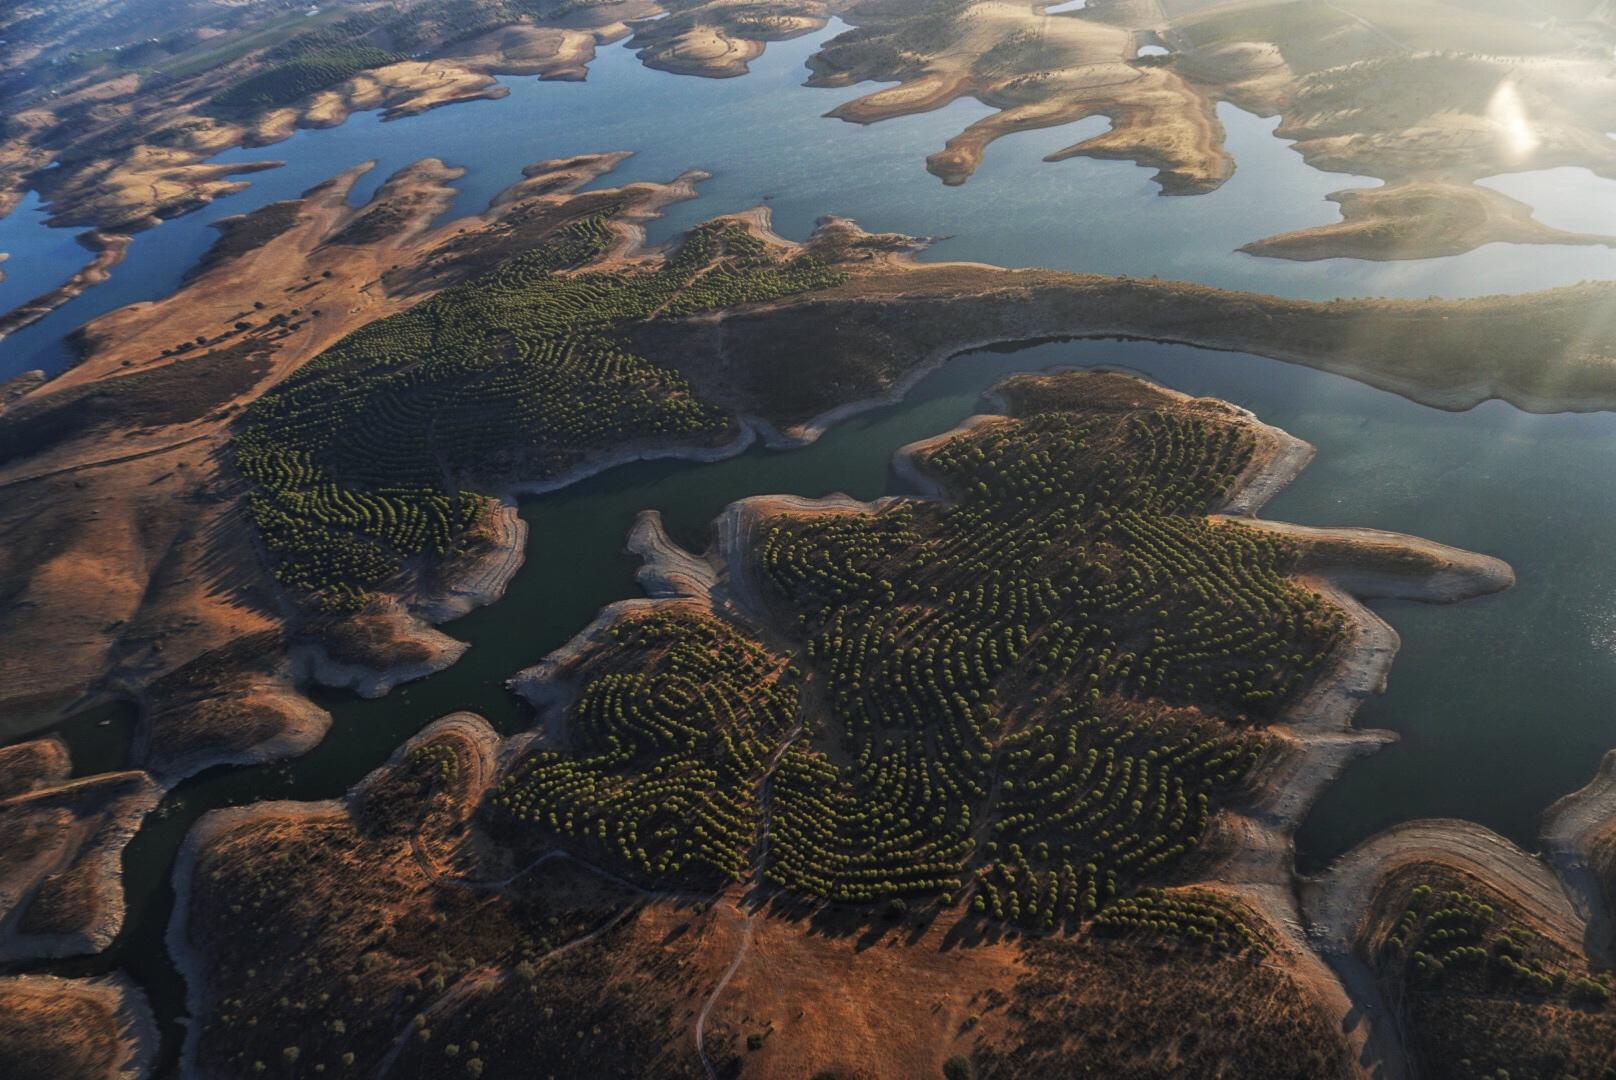 Hot Air Balloon Flight over Alentejo - Sustainable Travel Blog